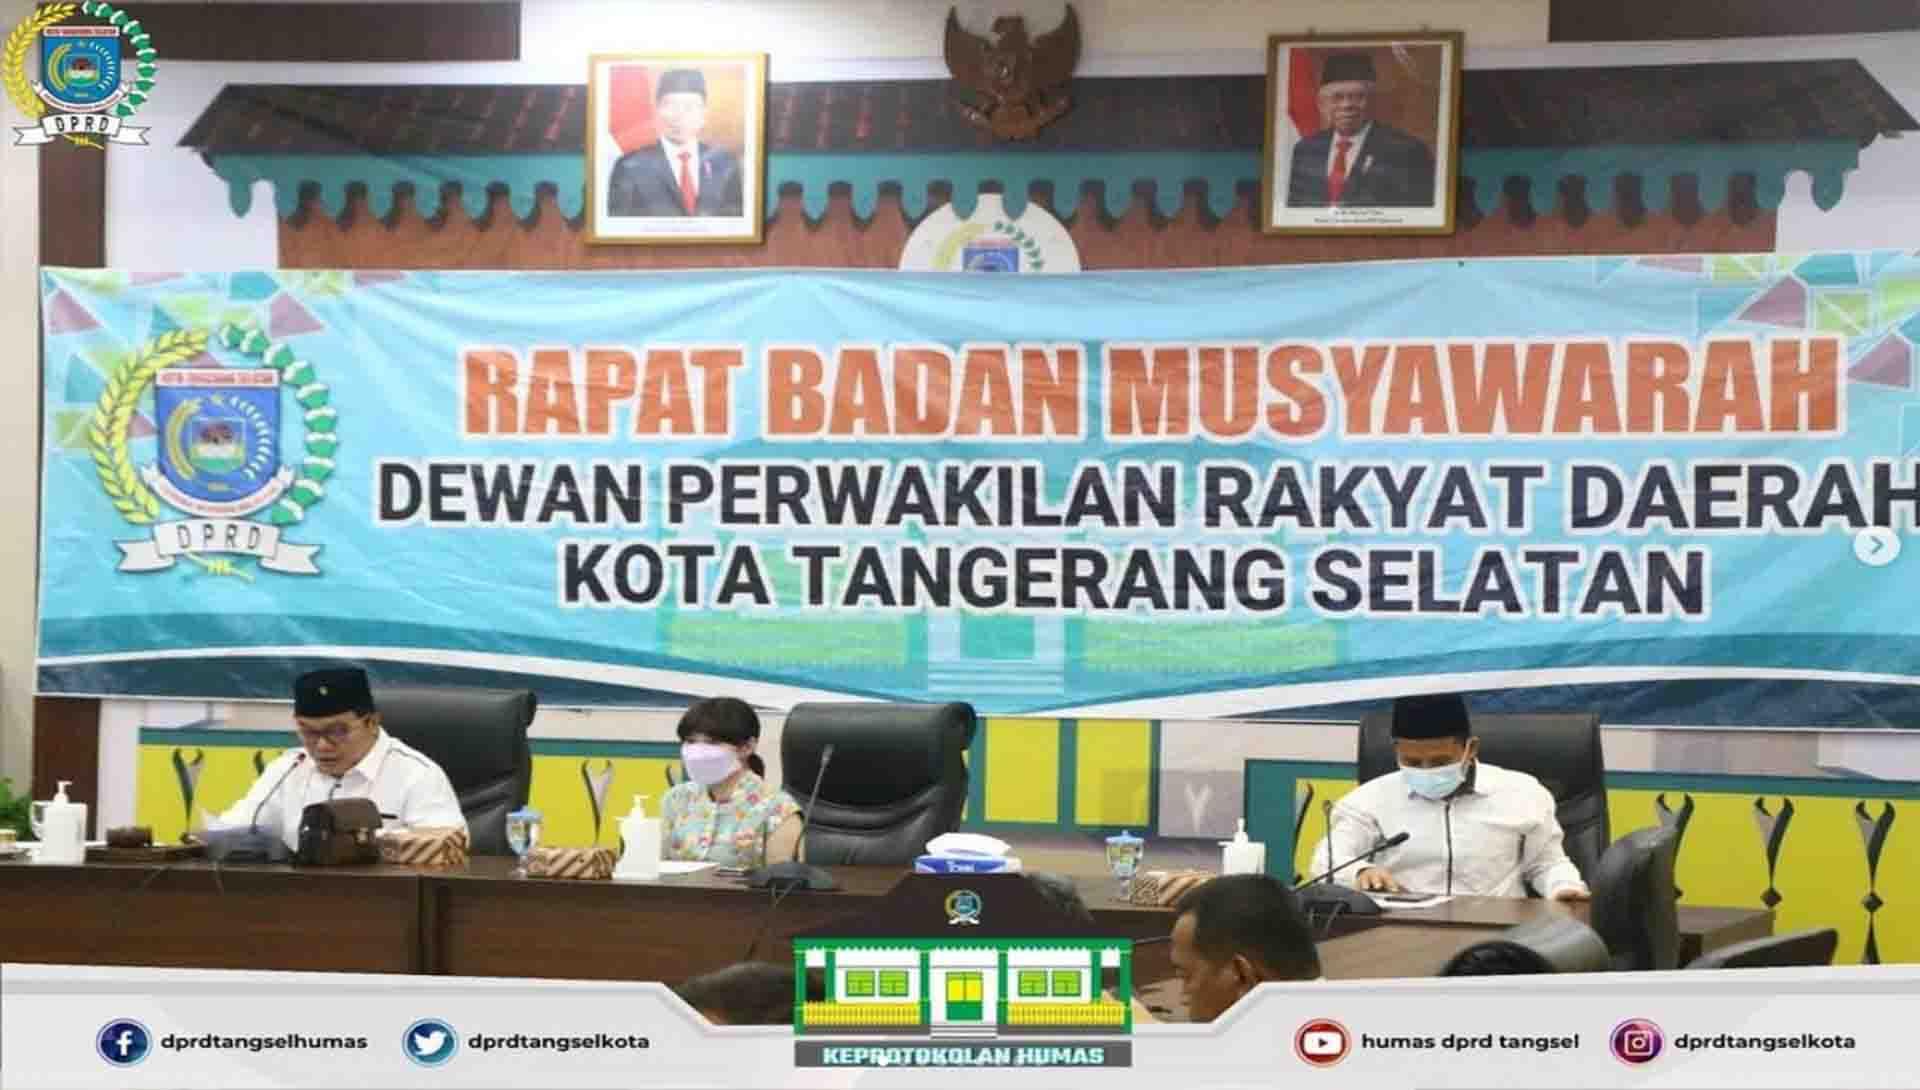 Badan Musyawarah Gelar Rapat Dengan 3 (tiga) Agenda